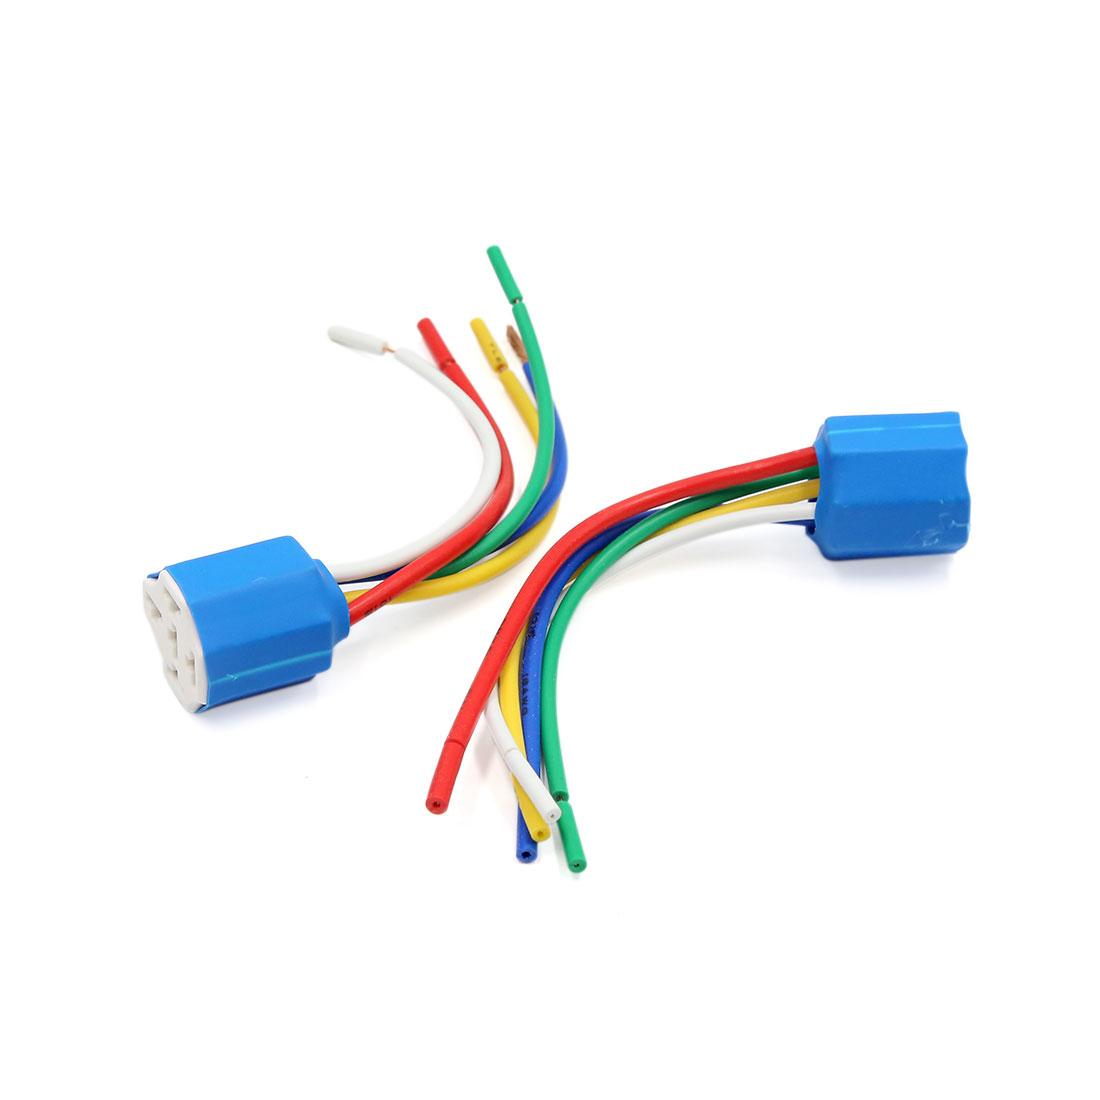 2pcs Universal Ceramic 5 Wires Car Headlight Fog Lamp Bulb Wiring Harness Socket